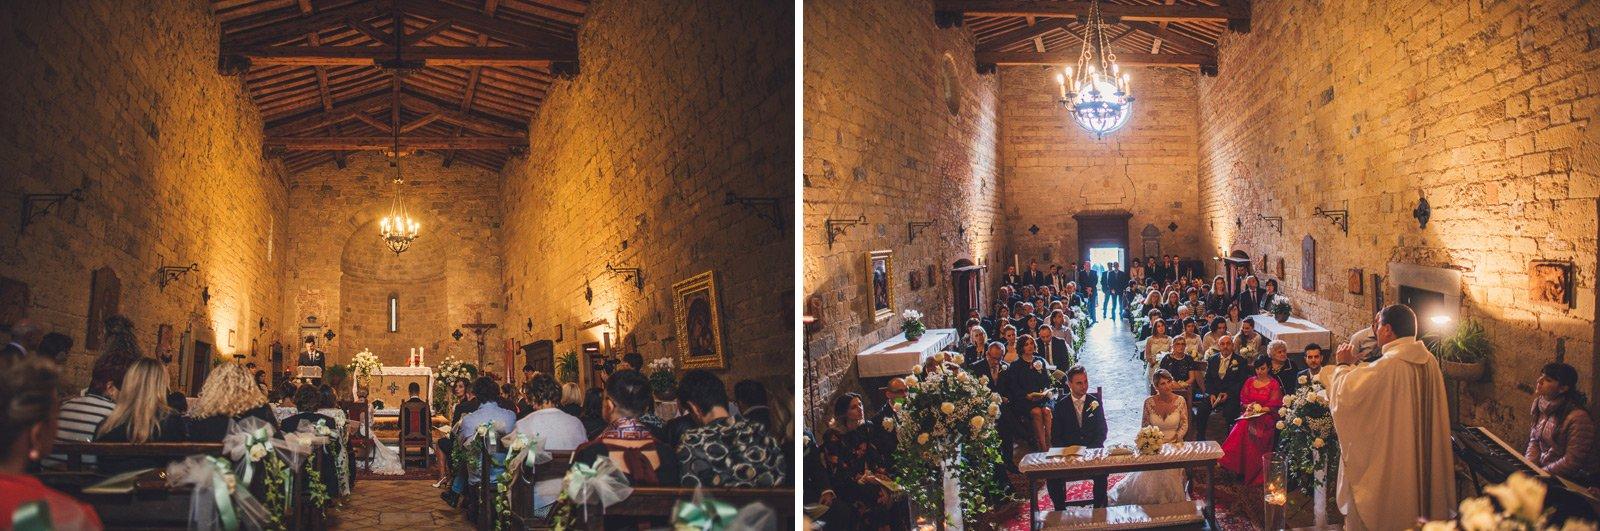 044-wedding-florence-palazzo-borghese